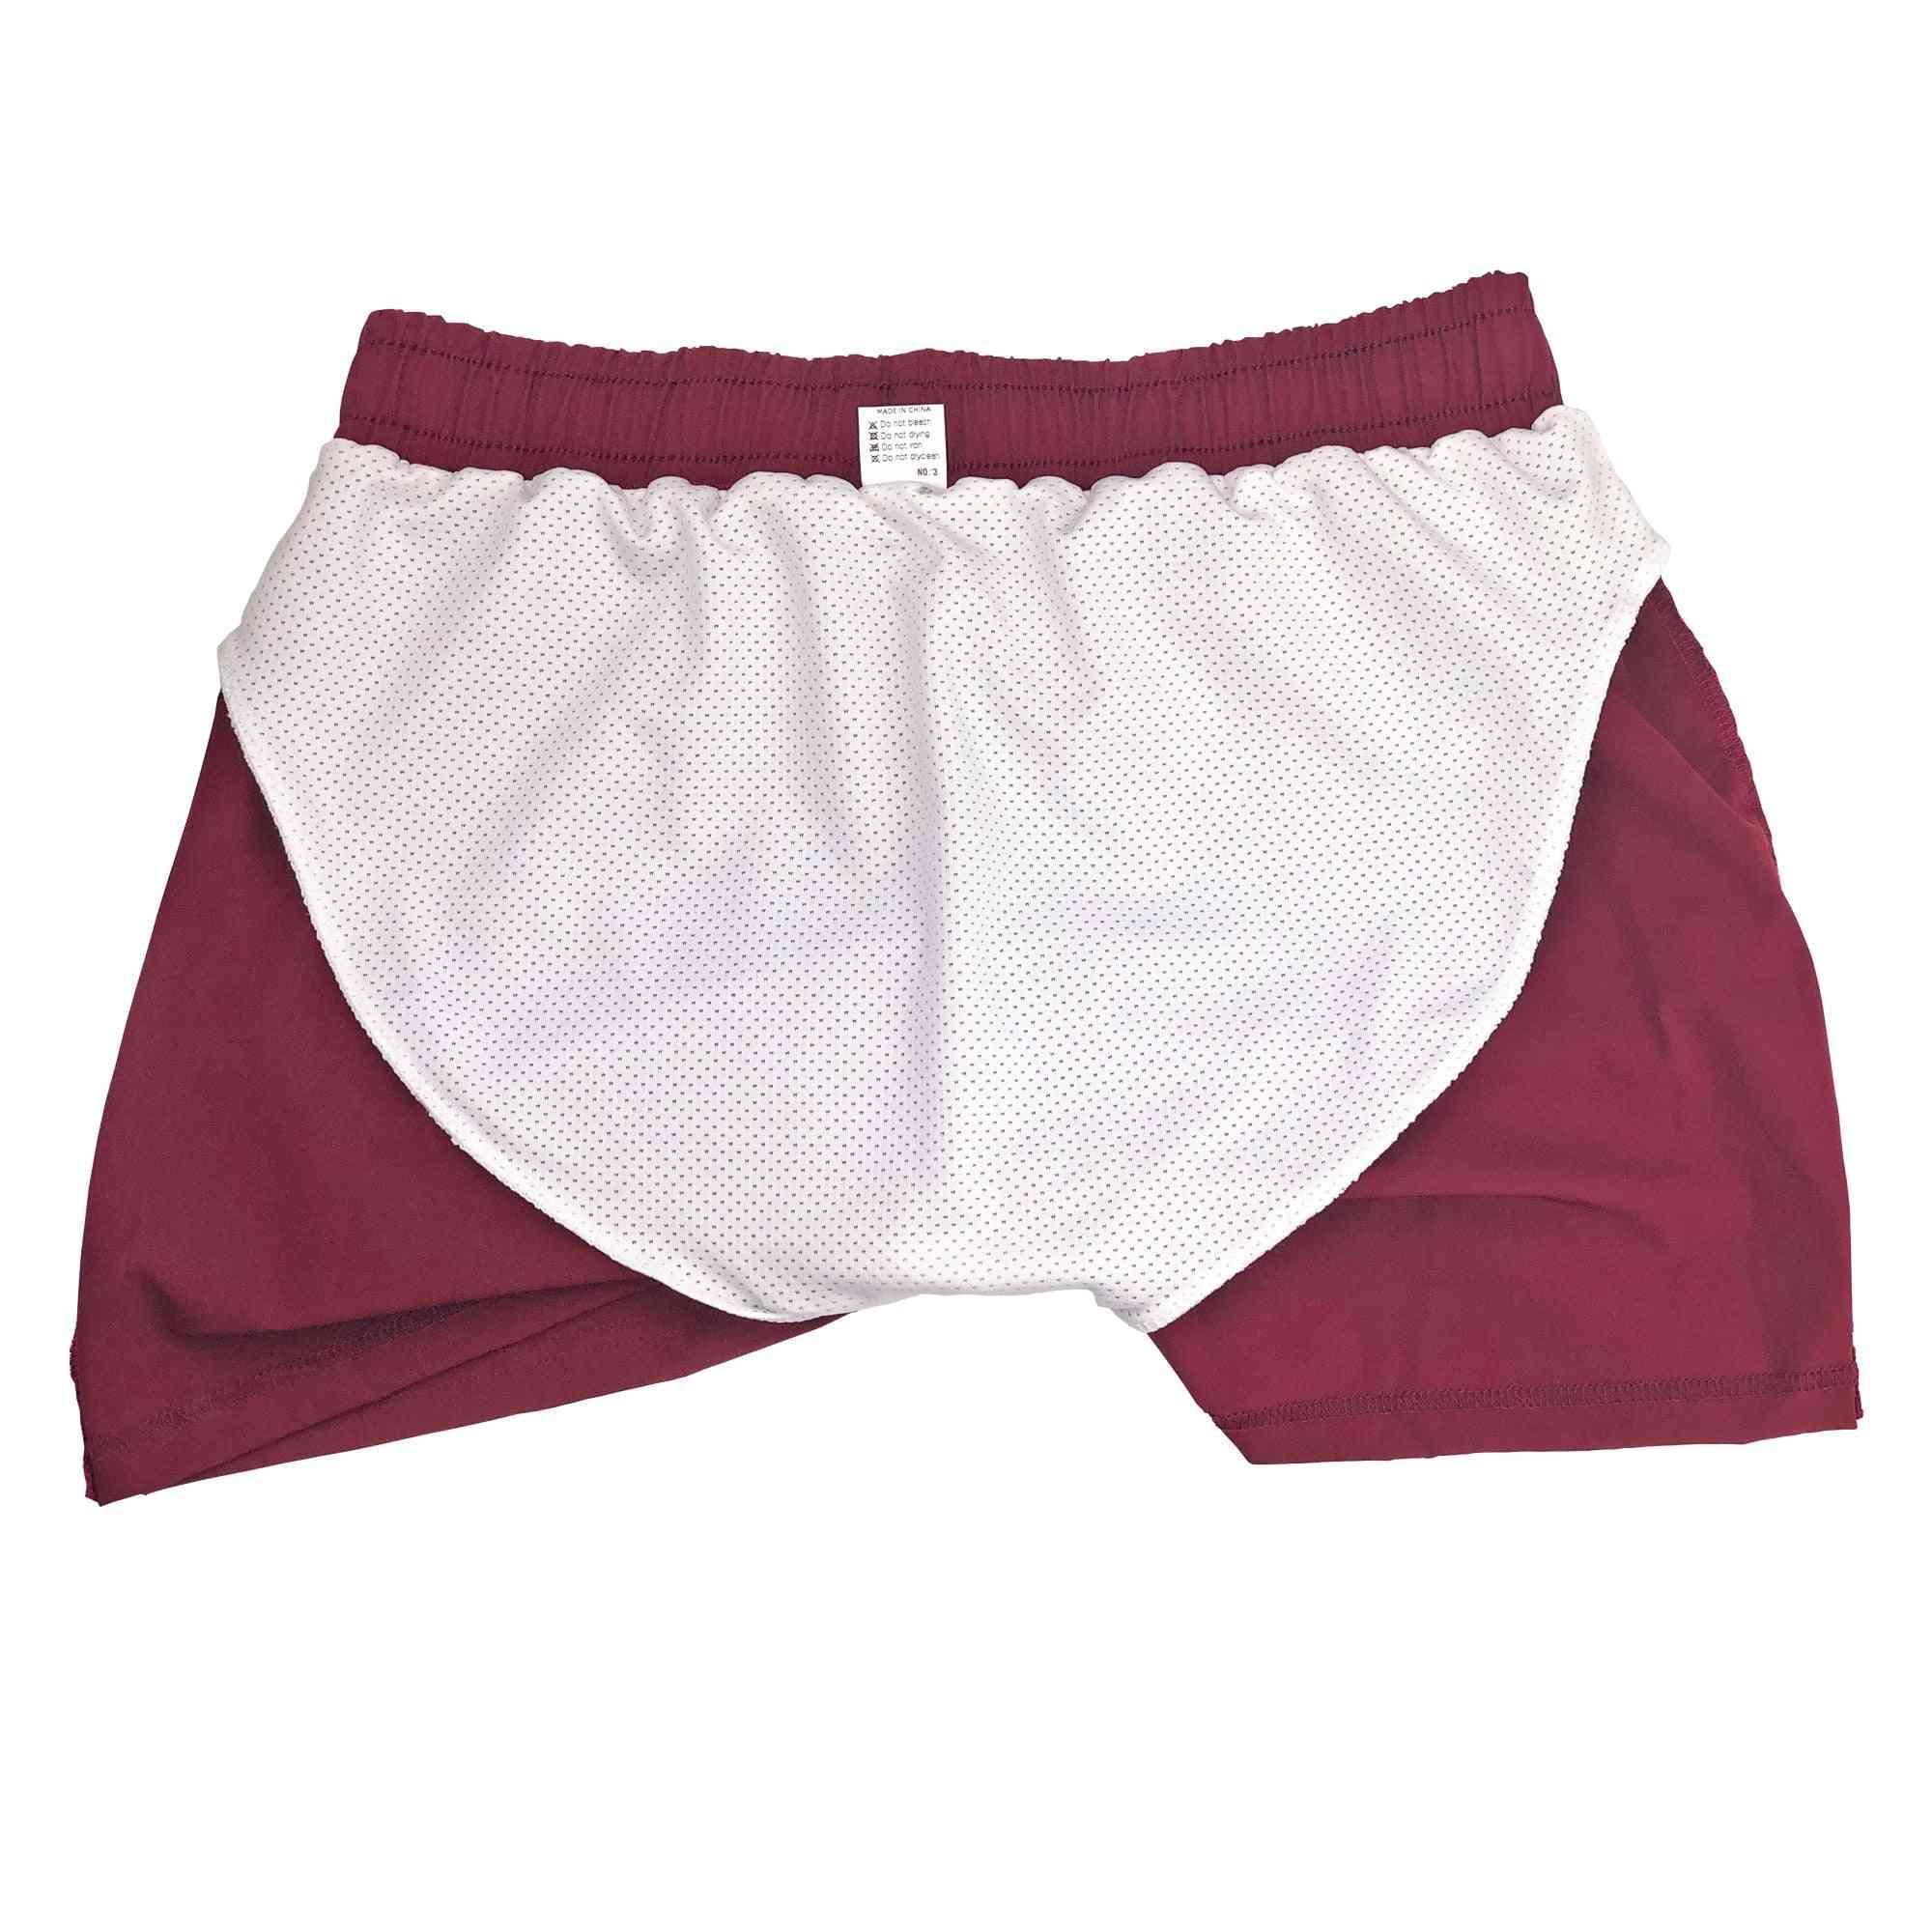 Summer Beach Boxer, Swimming Trunks, Swimsuit Shorts